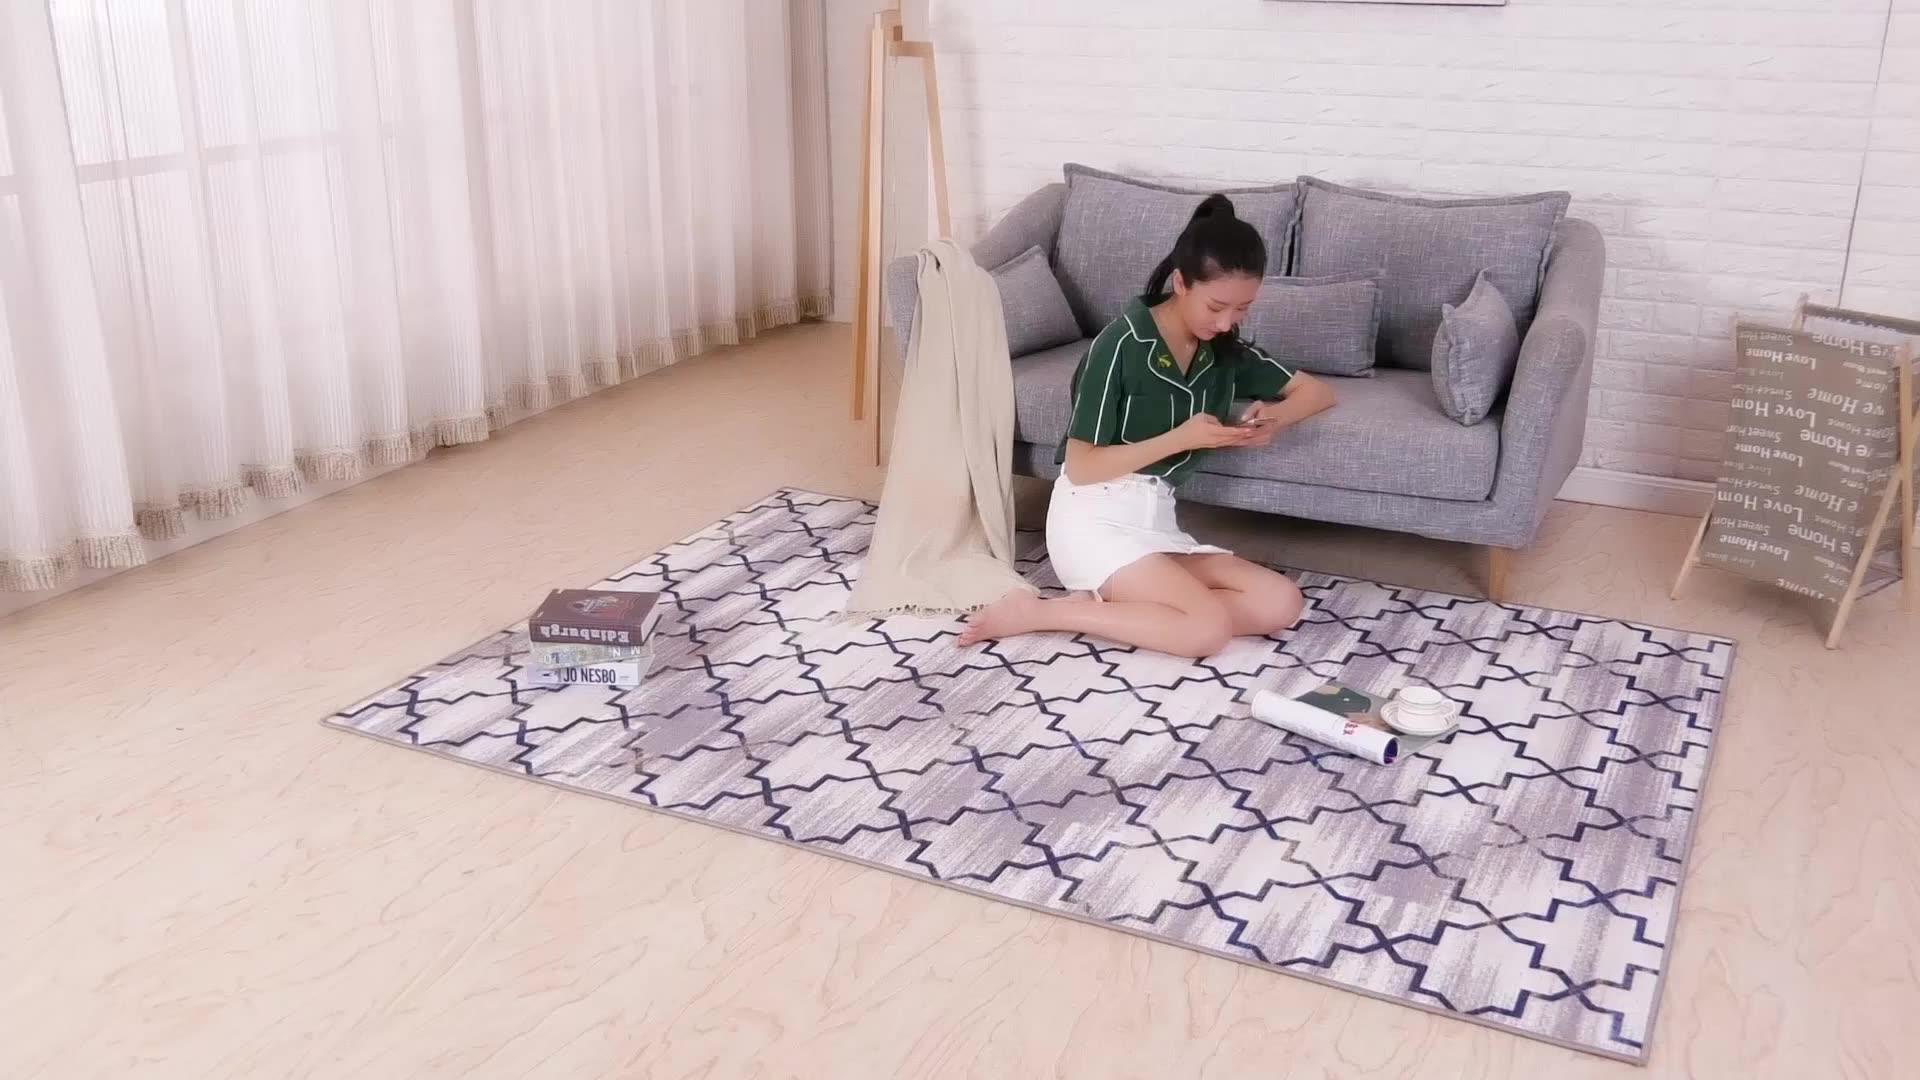 Cetak Motif Bunga Kustom Karpet Lantai Ruang Tamu Karpet Area Pada Garis Tapis Salon Alfombra De Sala Karpet Modern Pabrik Tianjin